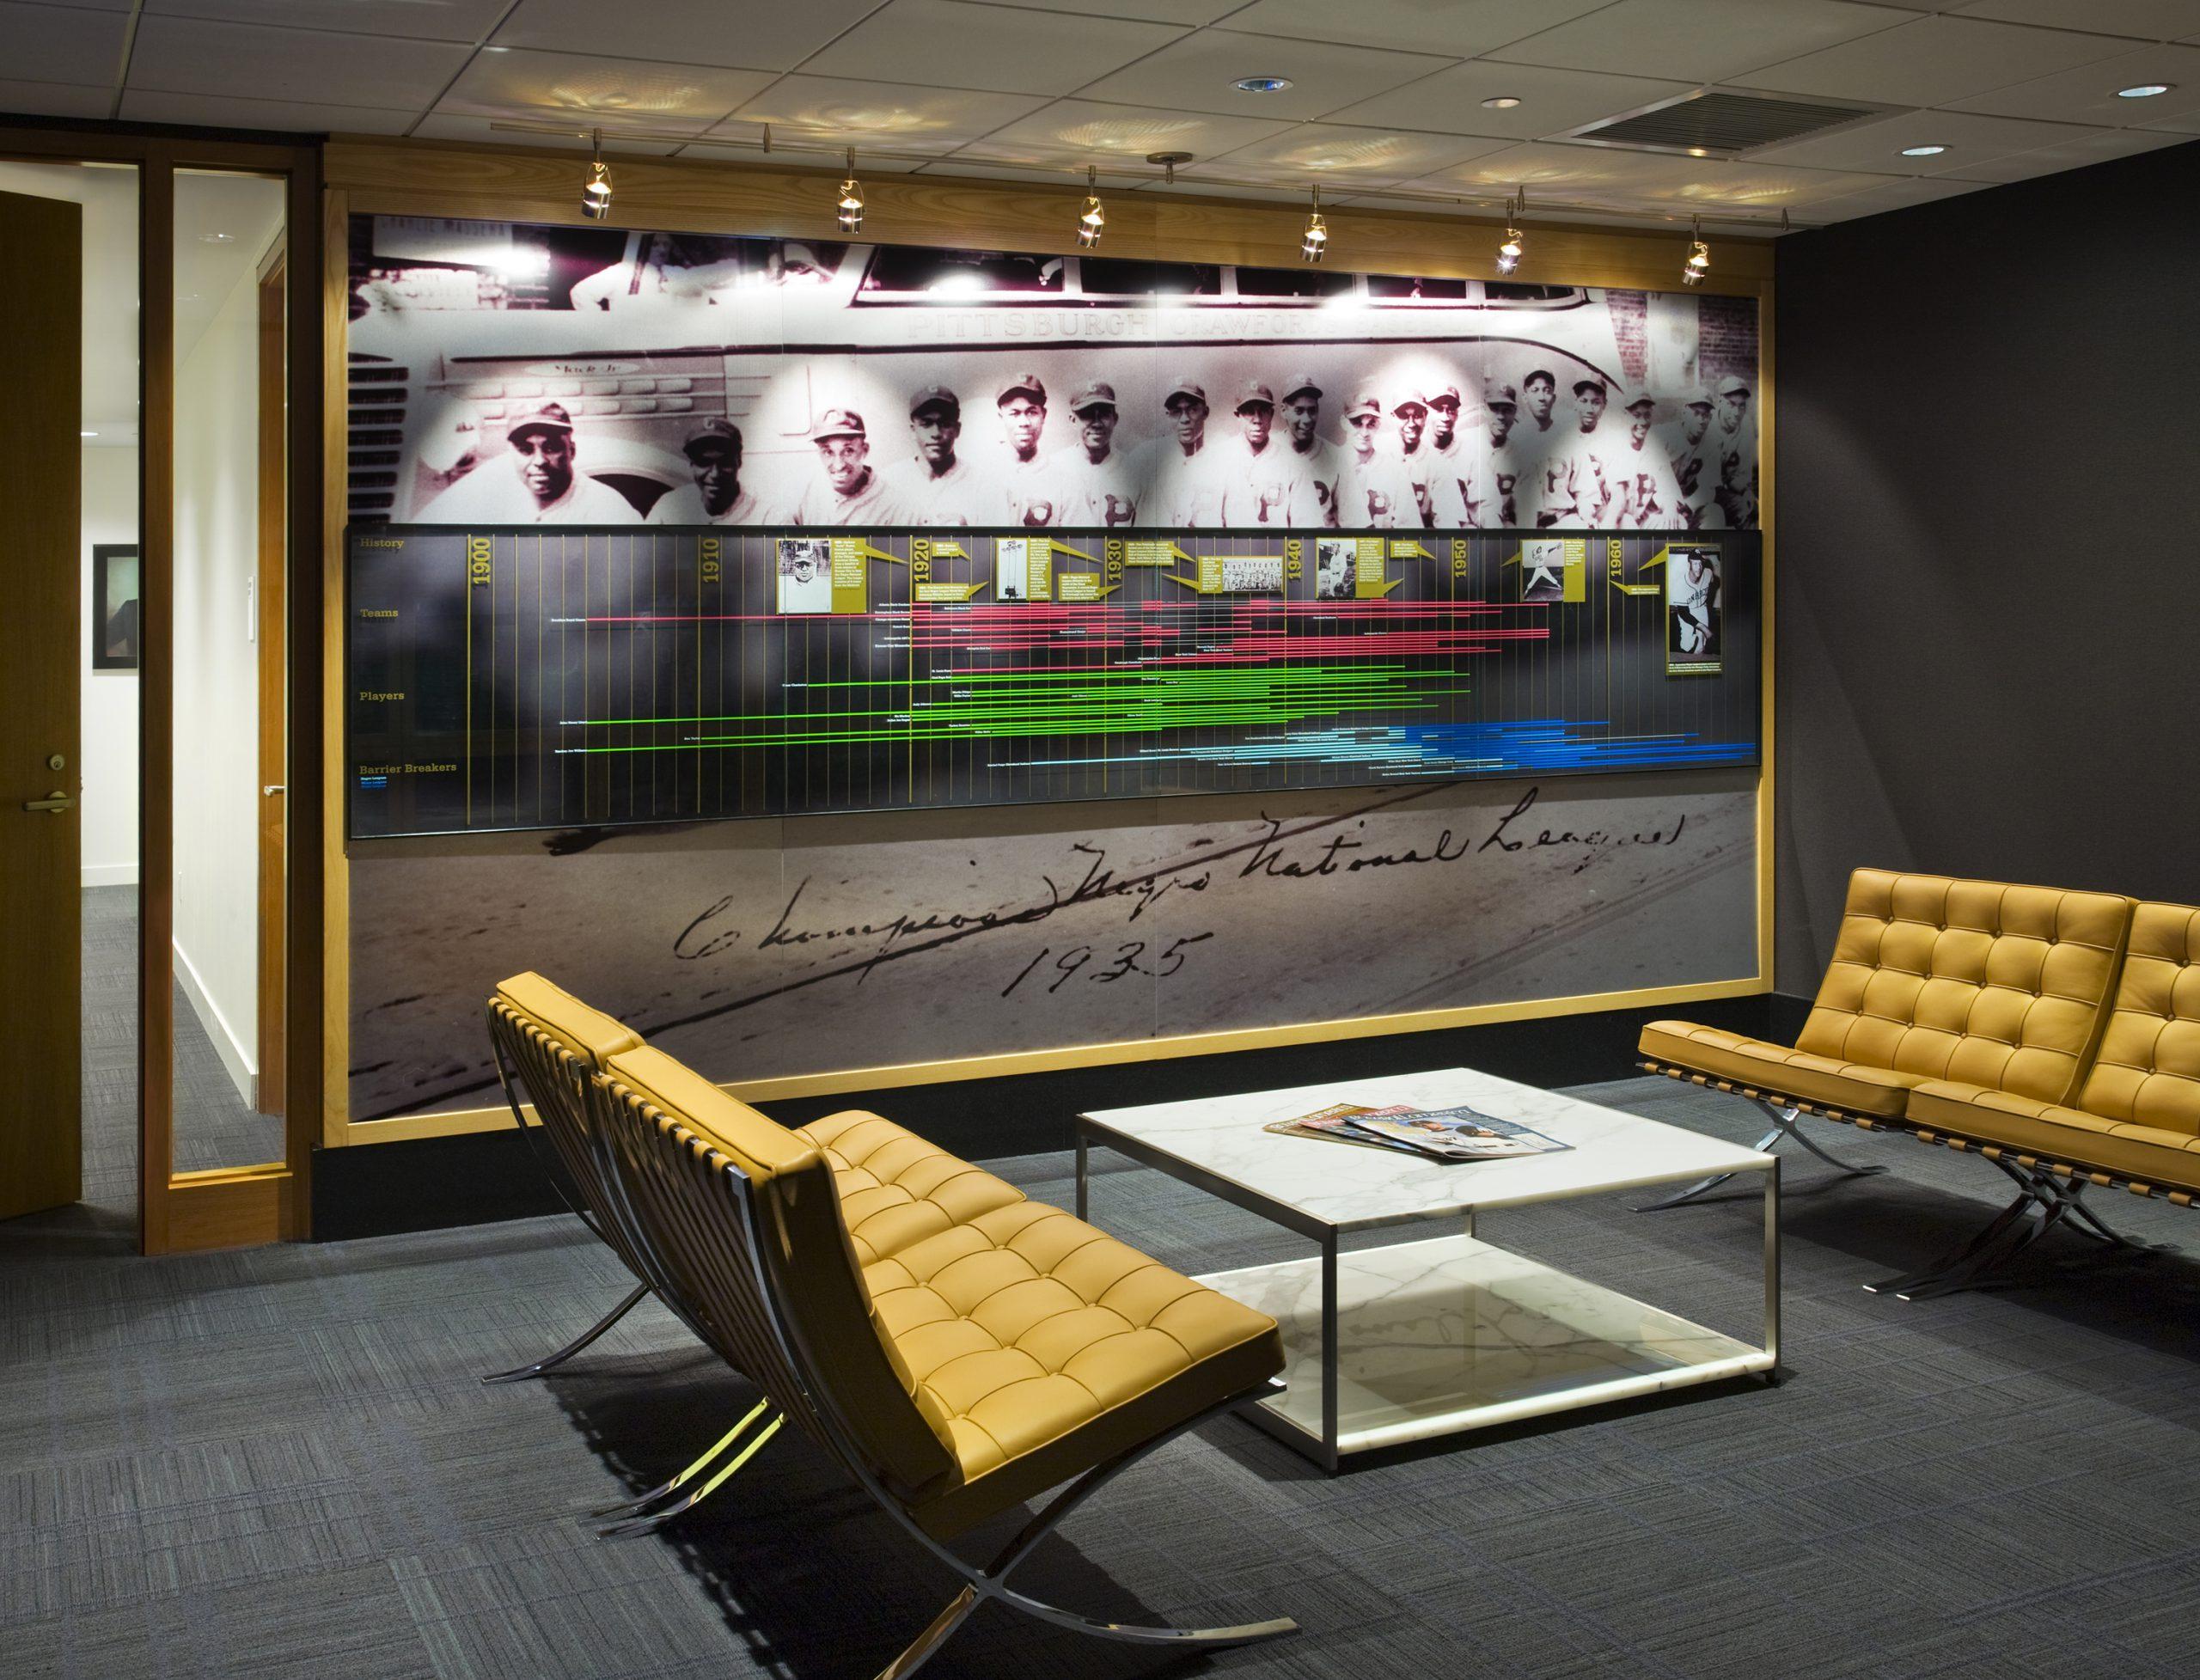 Project image 1 for Environmental Installations, Major League Baseball